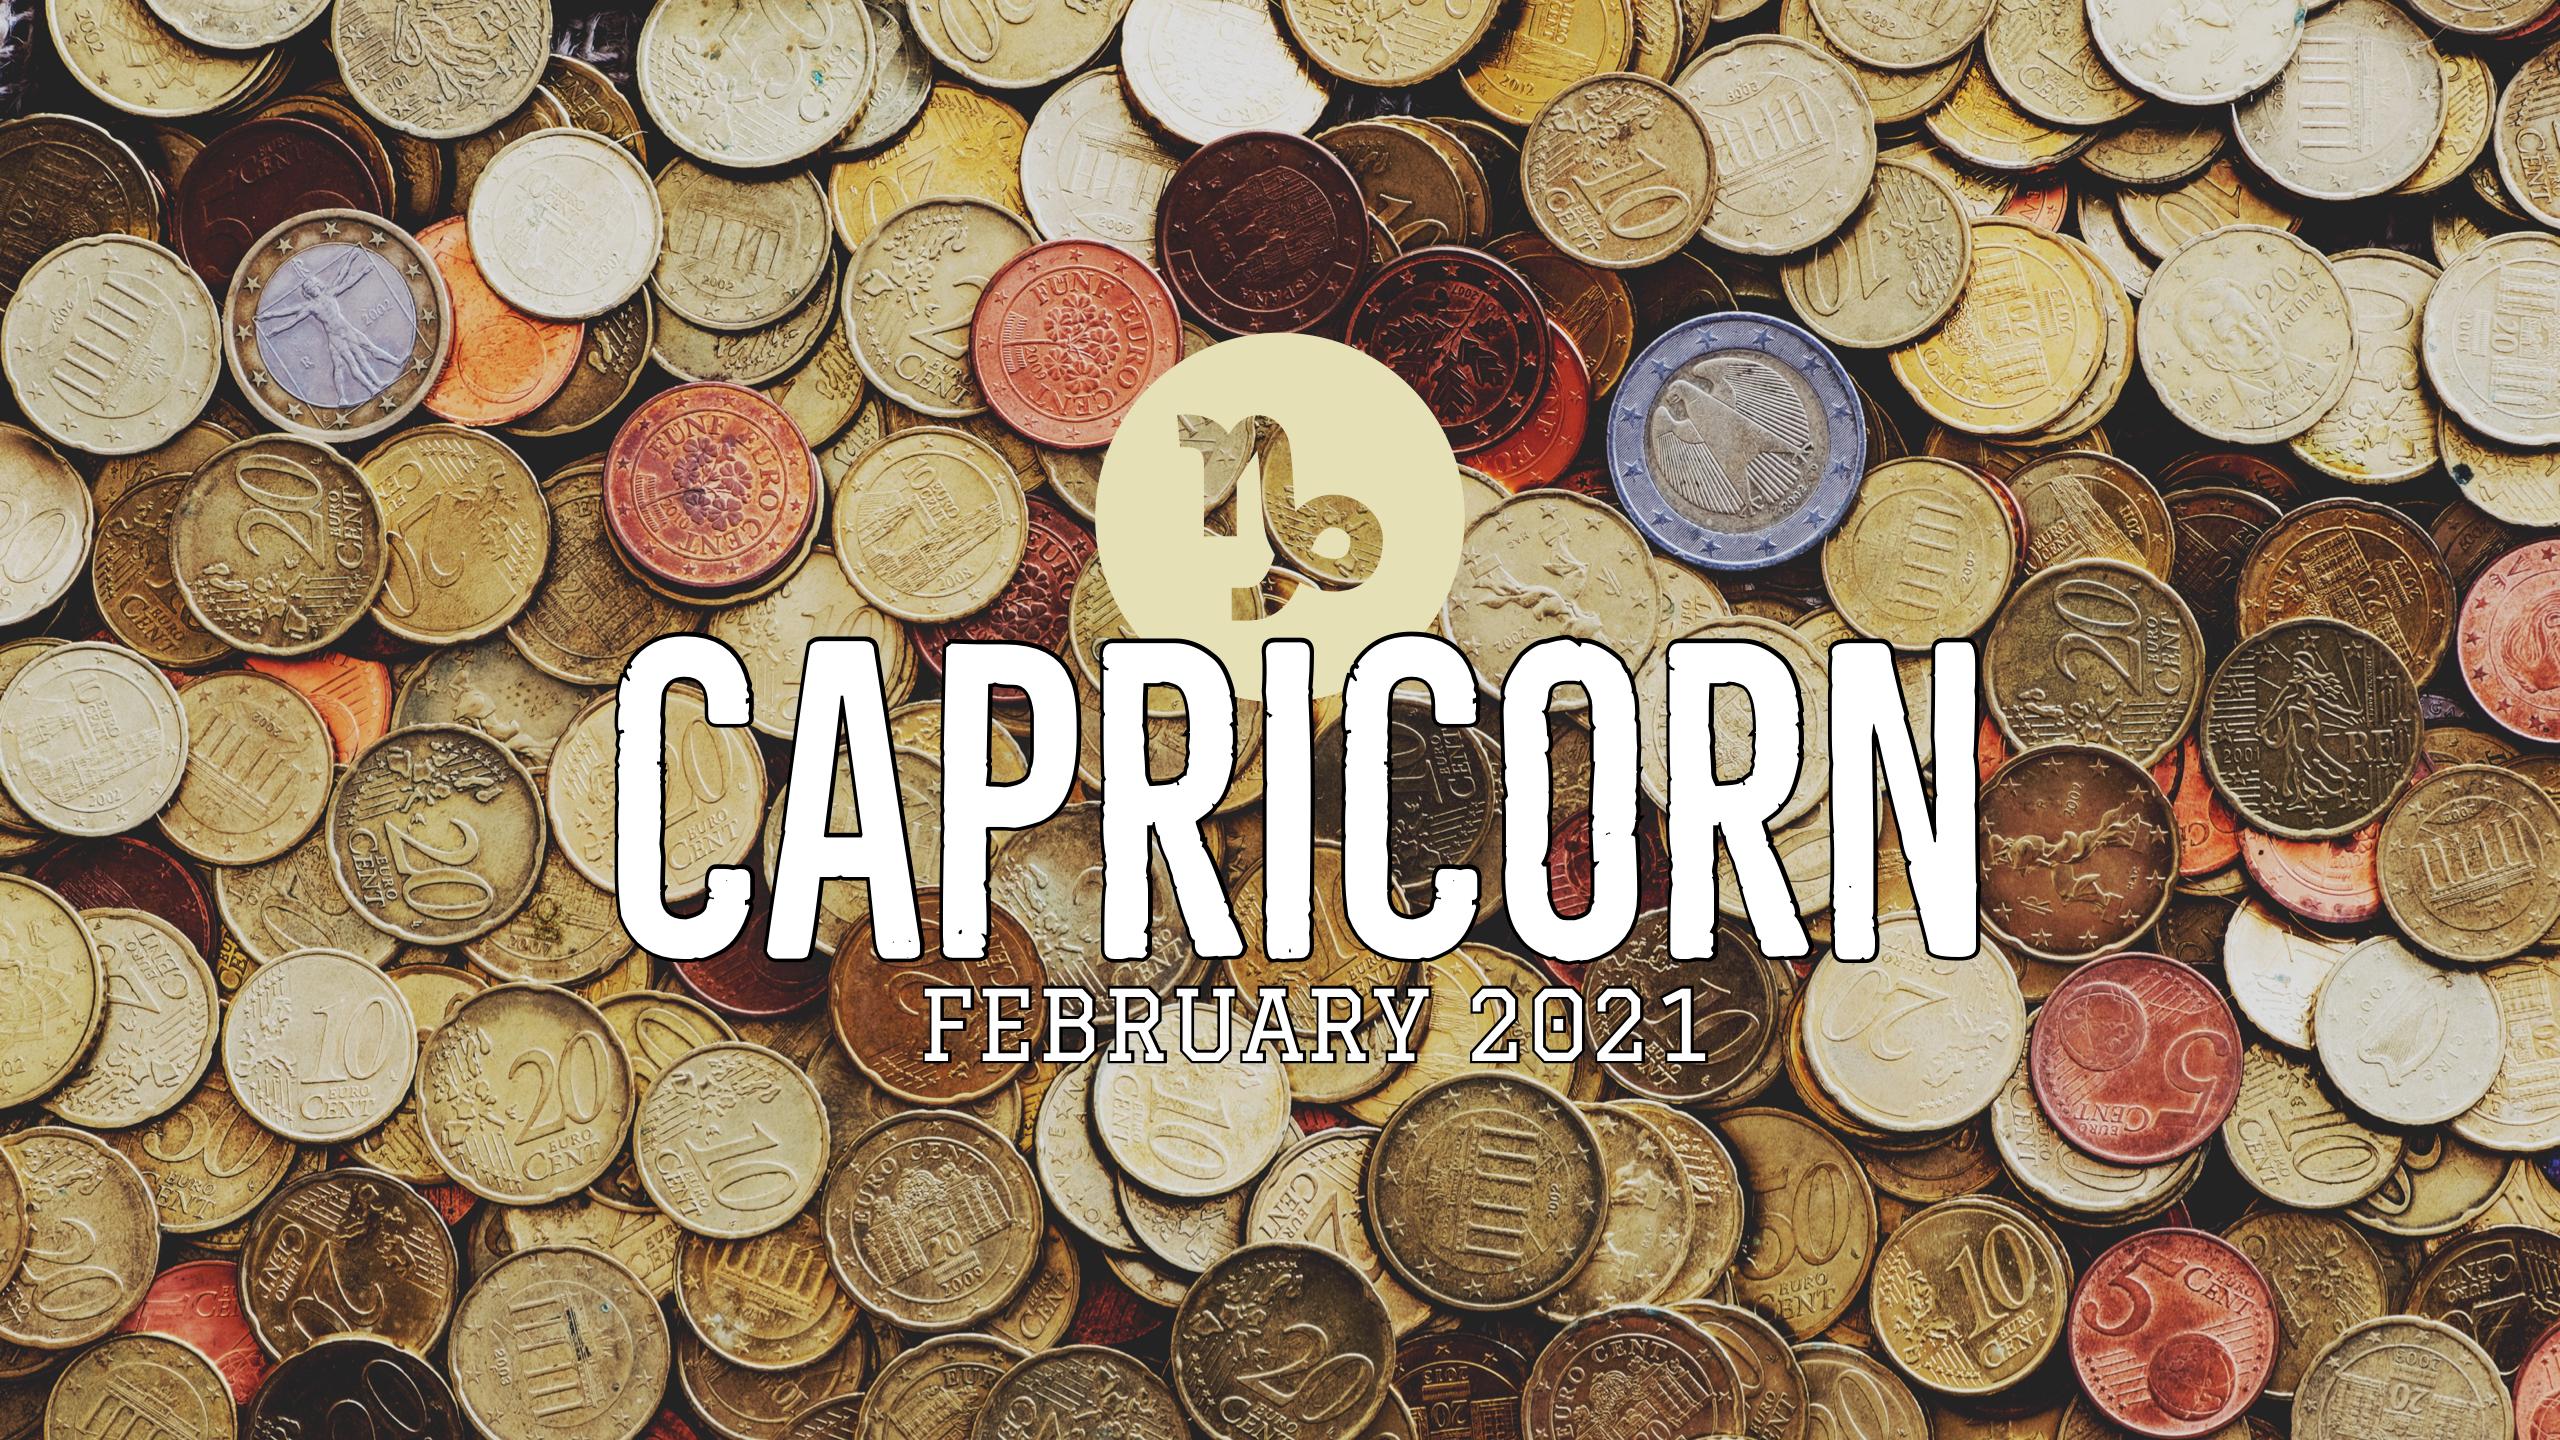 2021 02:Banner:10 Capricorn